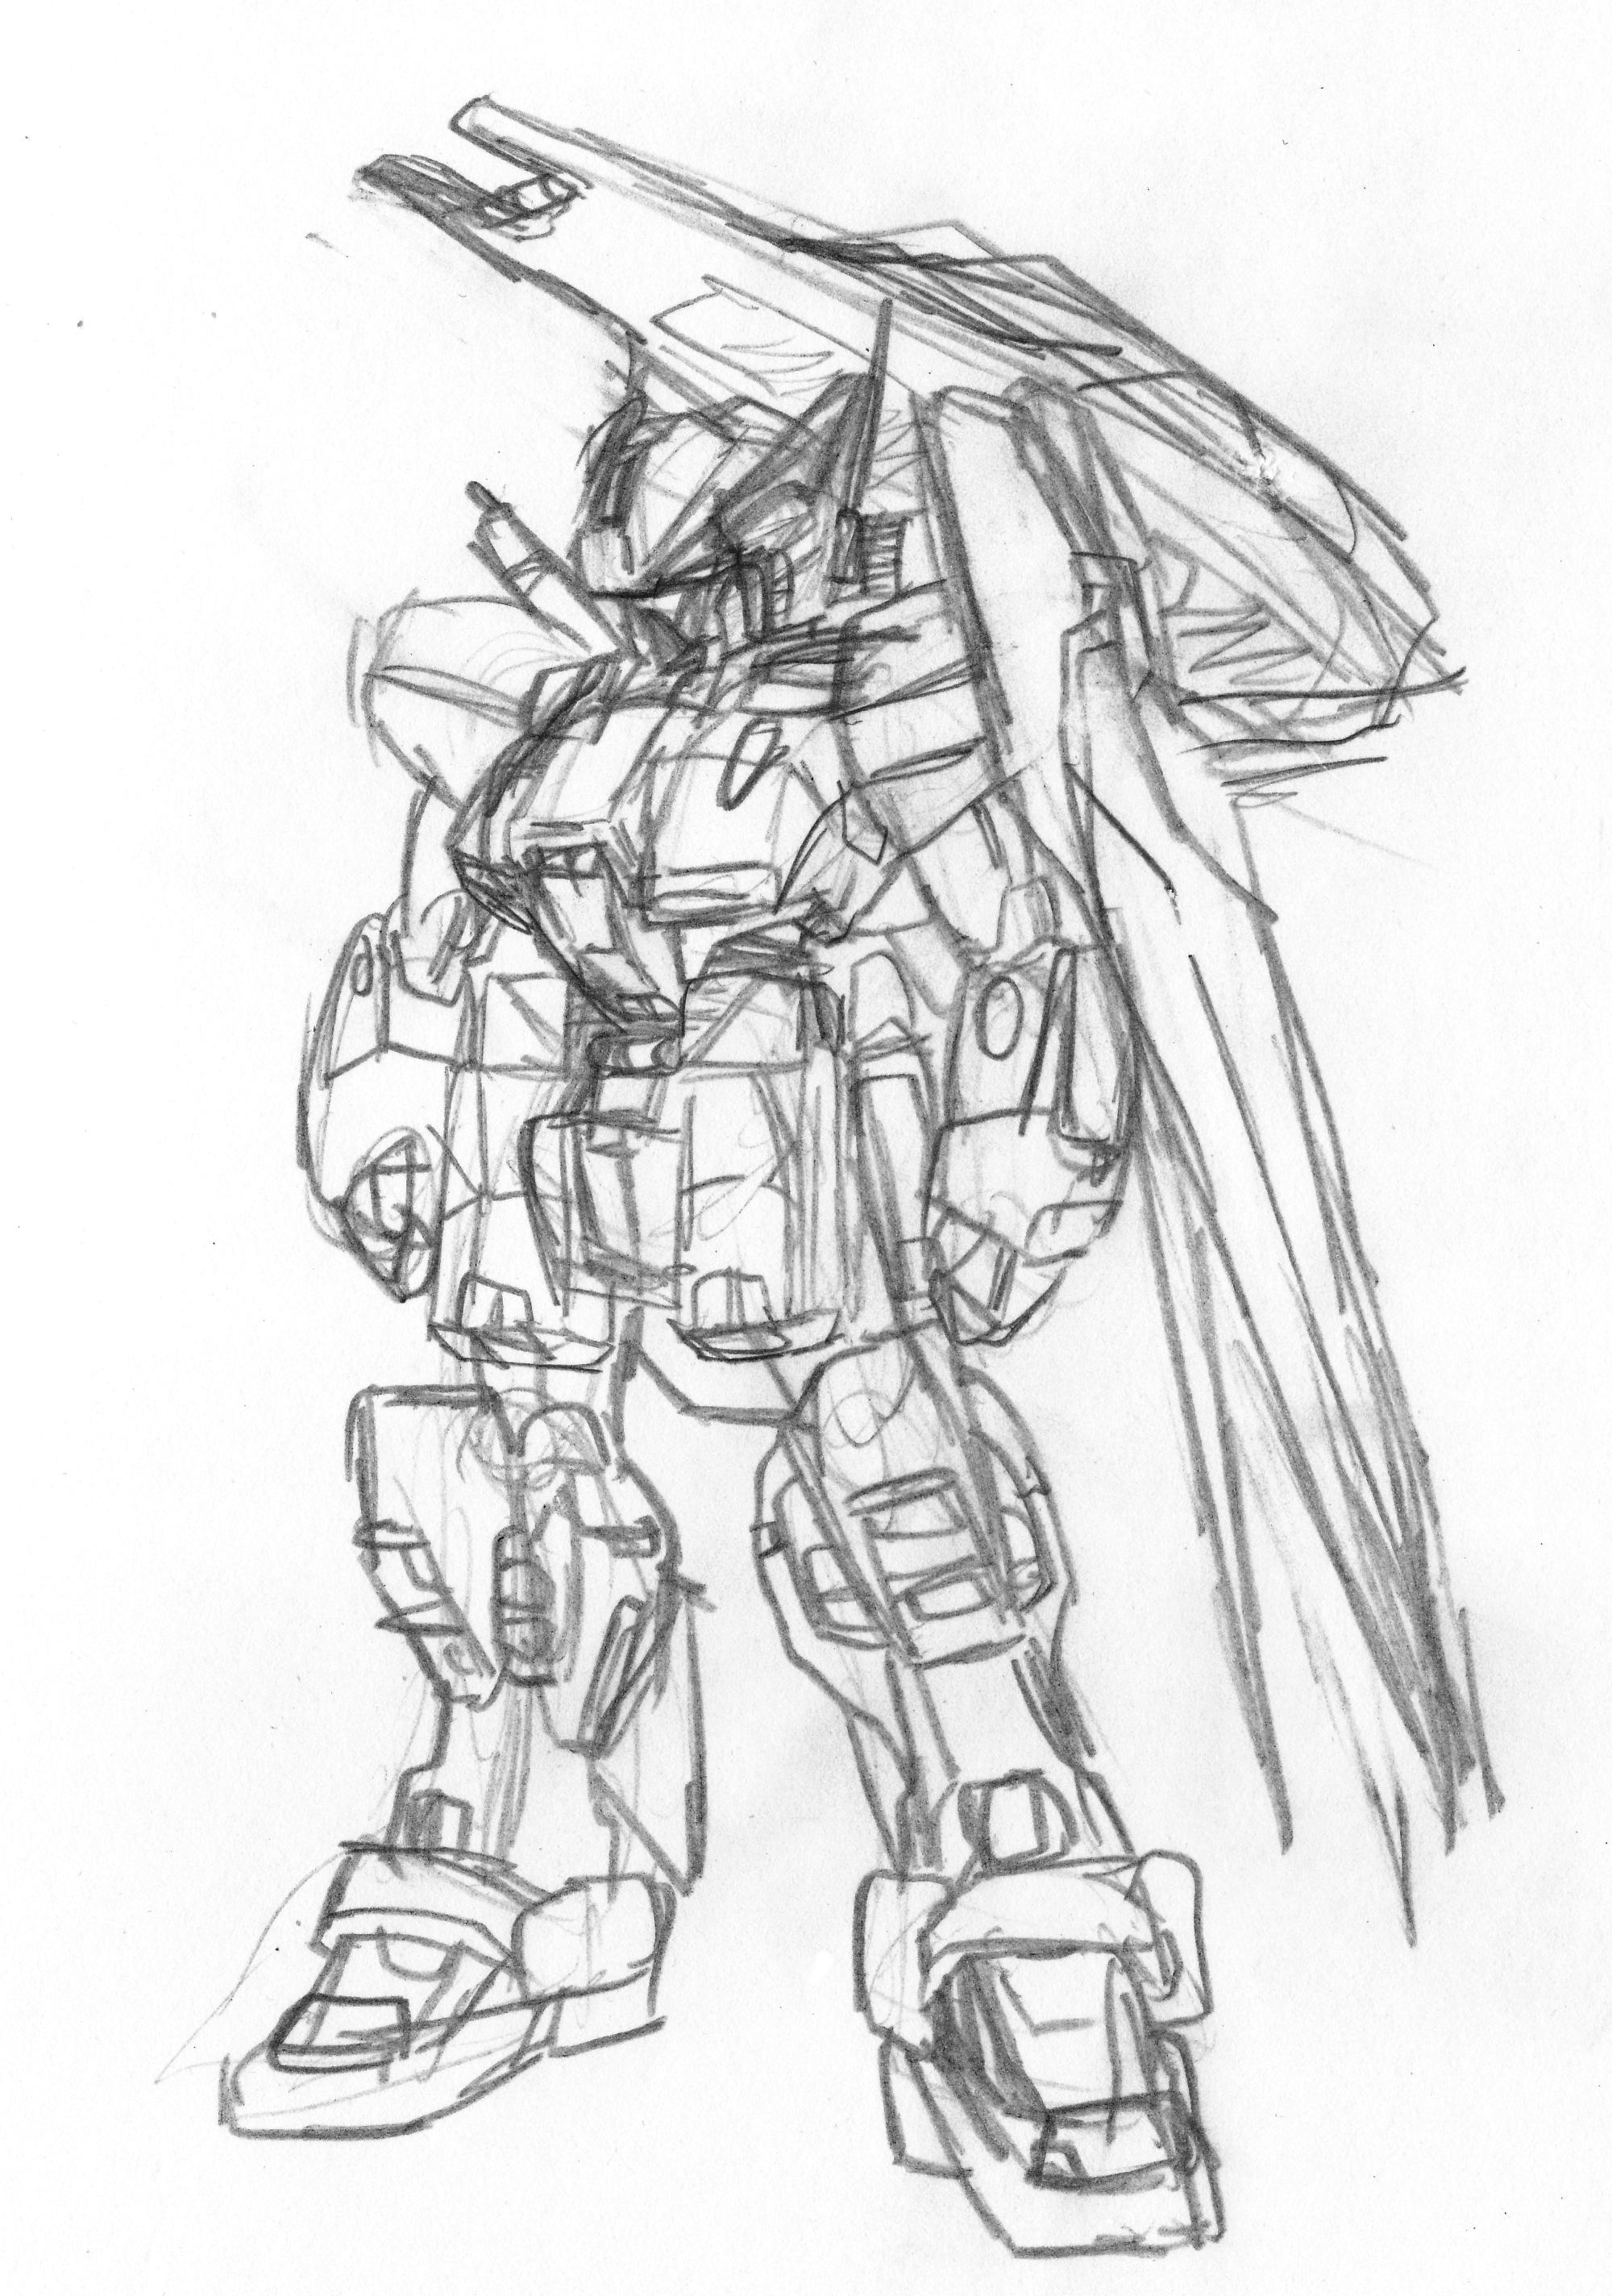 2000x2848 Advanced Hazel Custom Gunpla Sketch By Blayaden